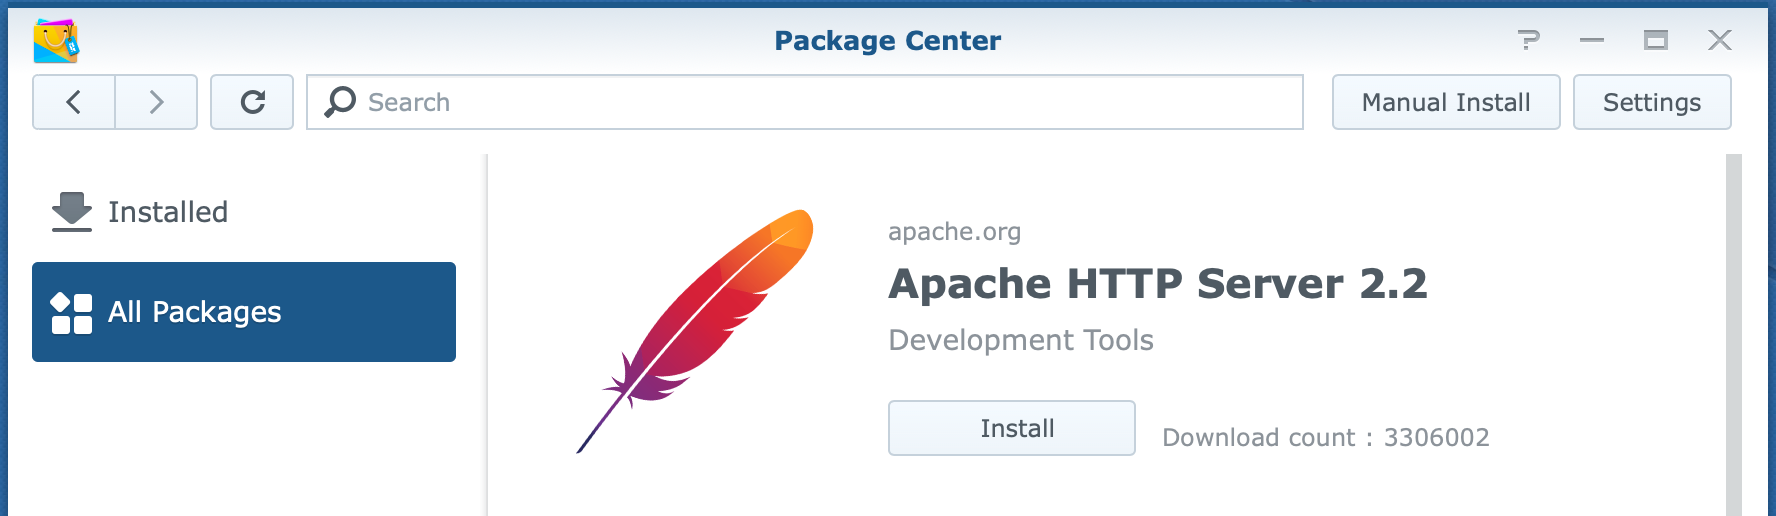 synology, package center, apache http server 2.2, dsm6